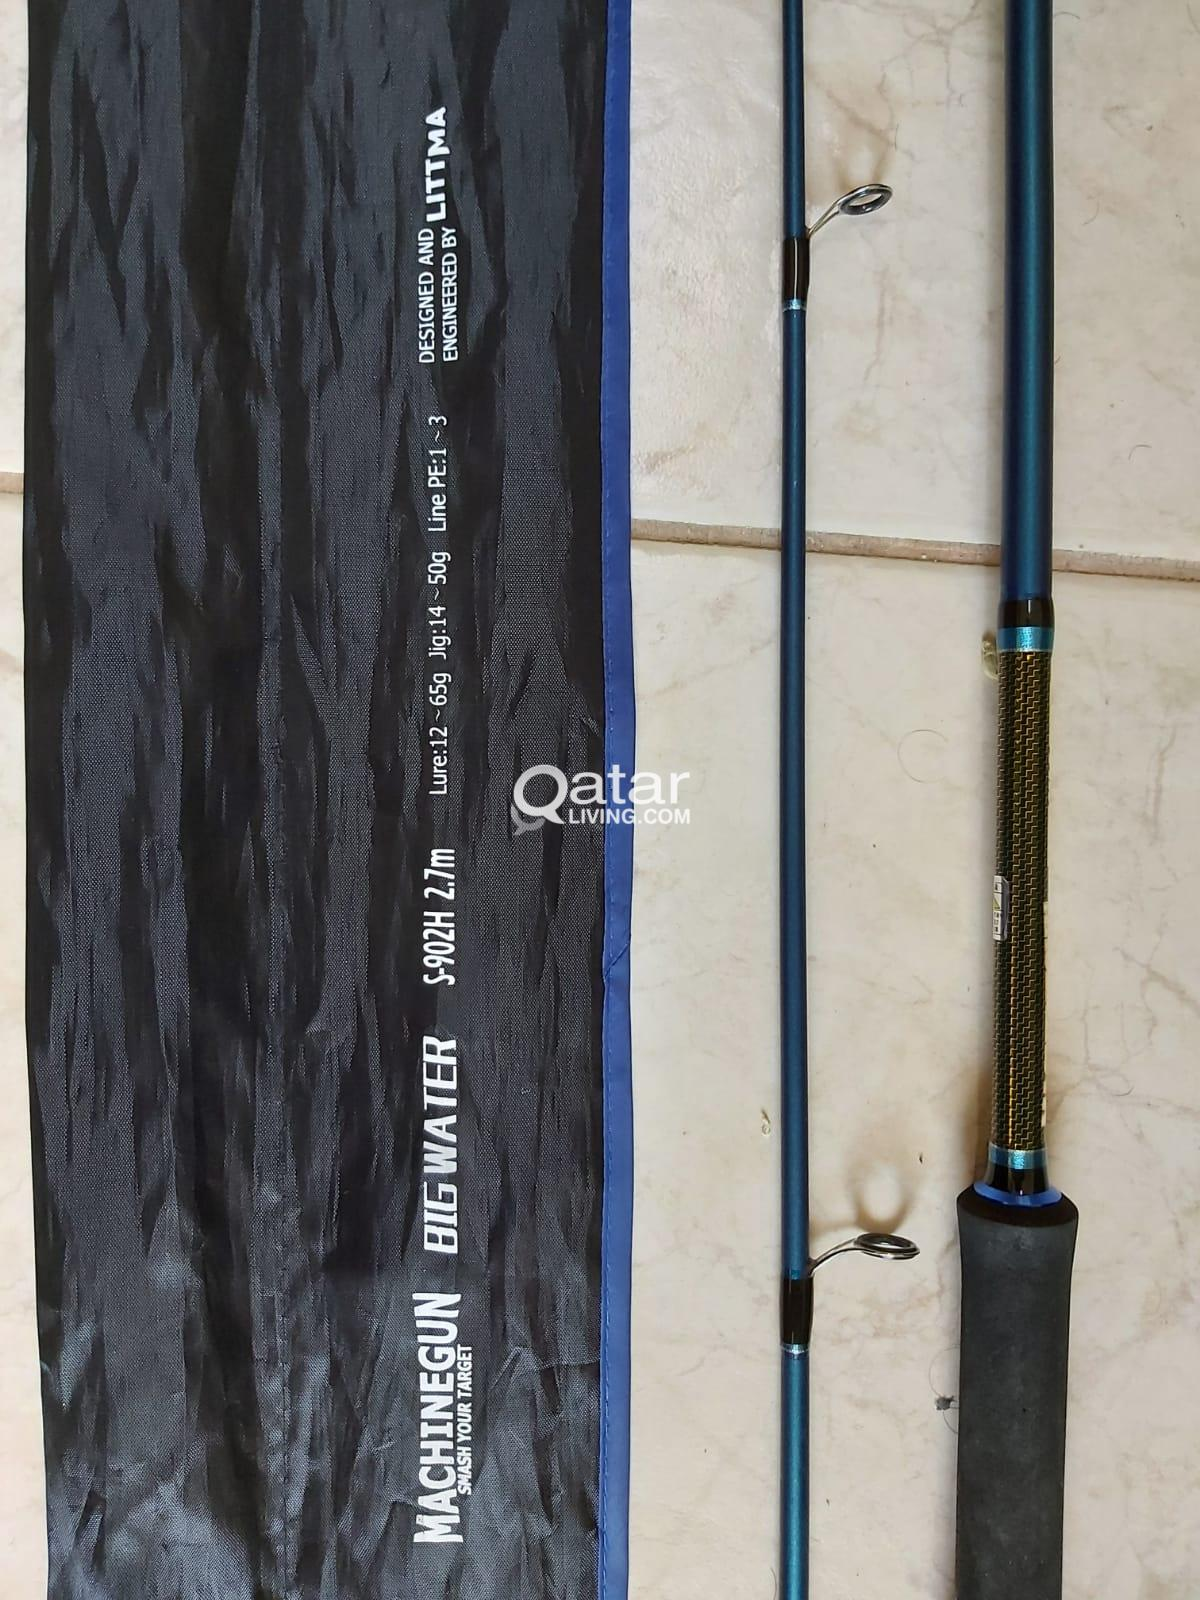 Fishing Rod 9 Feet, Fuji Guides